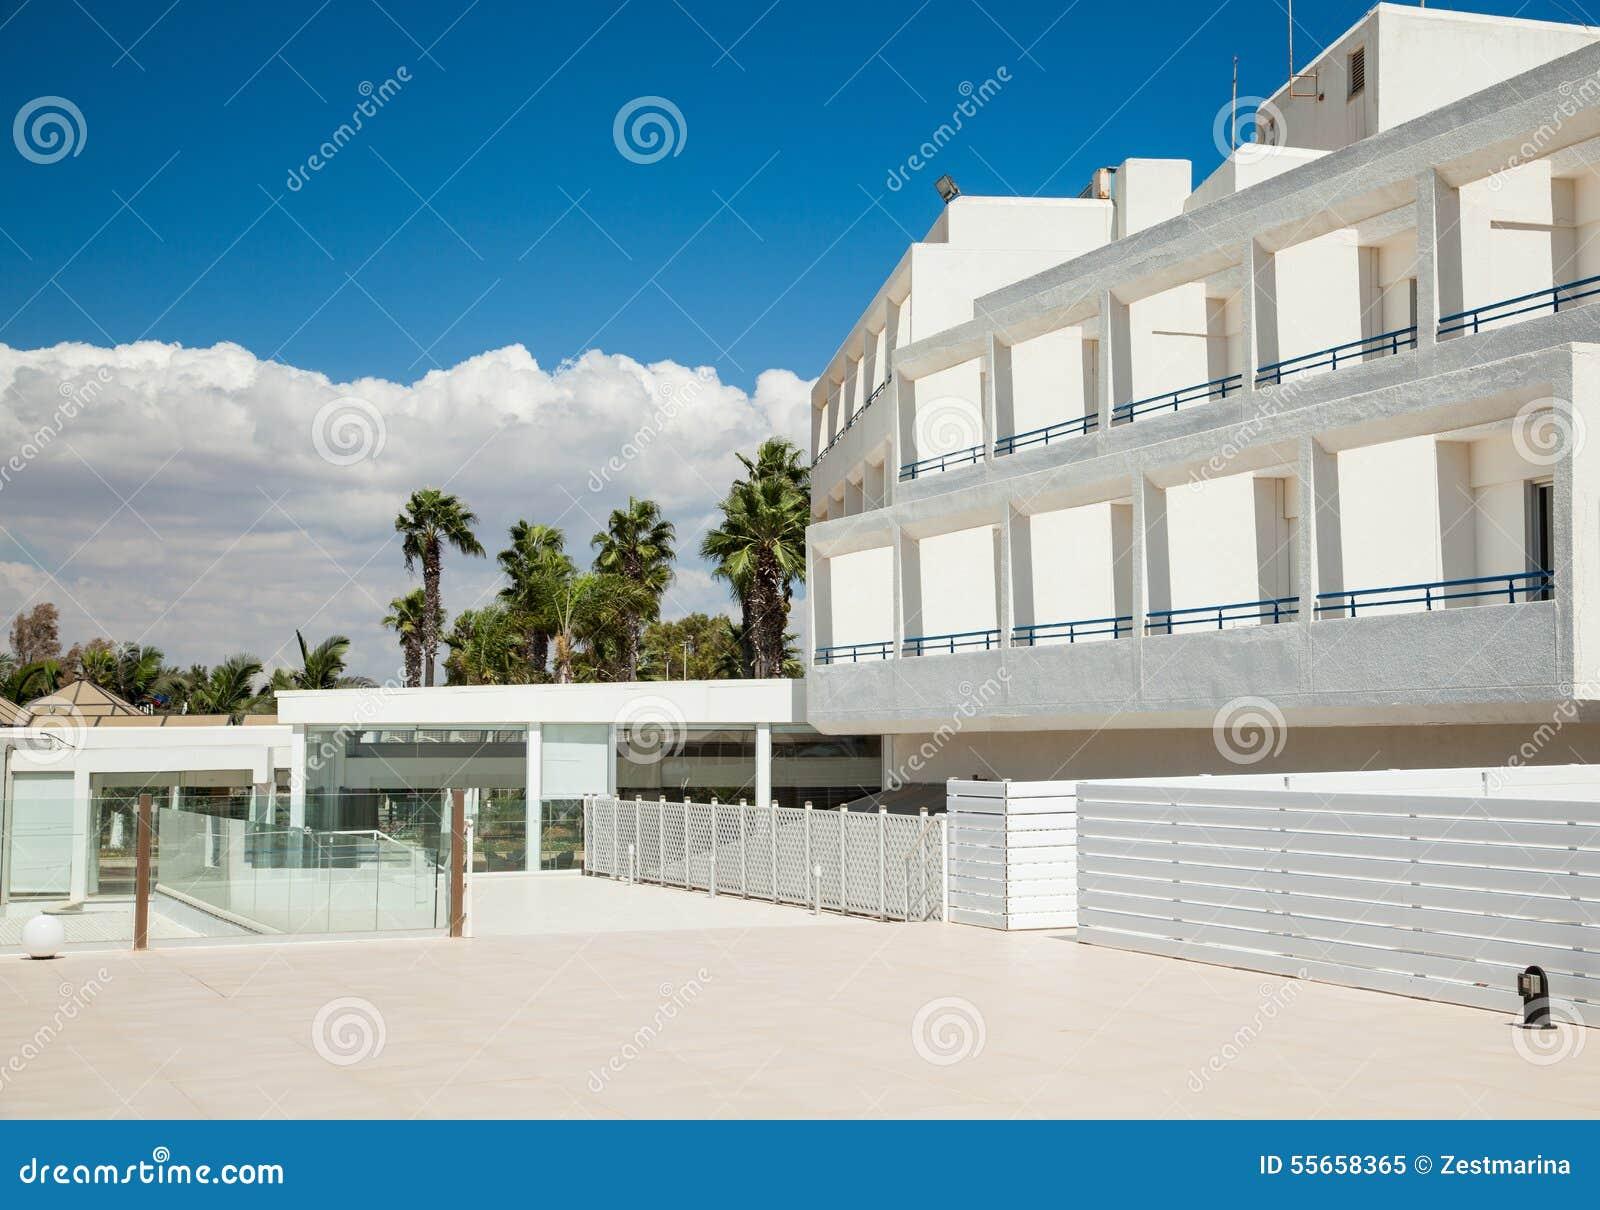 Hotel De Luxo Bonito Foto de Stock Imagem: 55658365 #025082 1300x1000 Banheiro De Hotel De Luxo